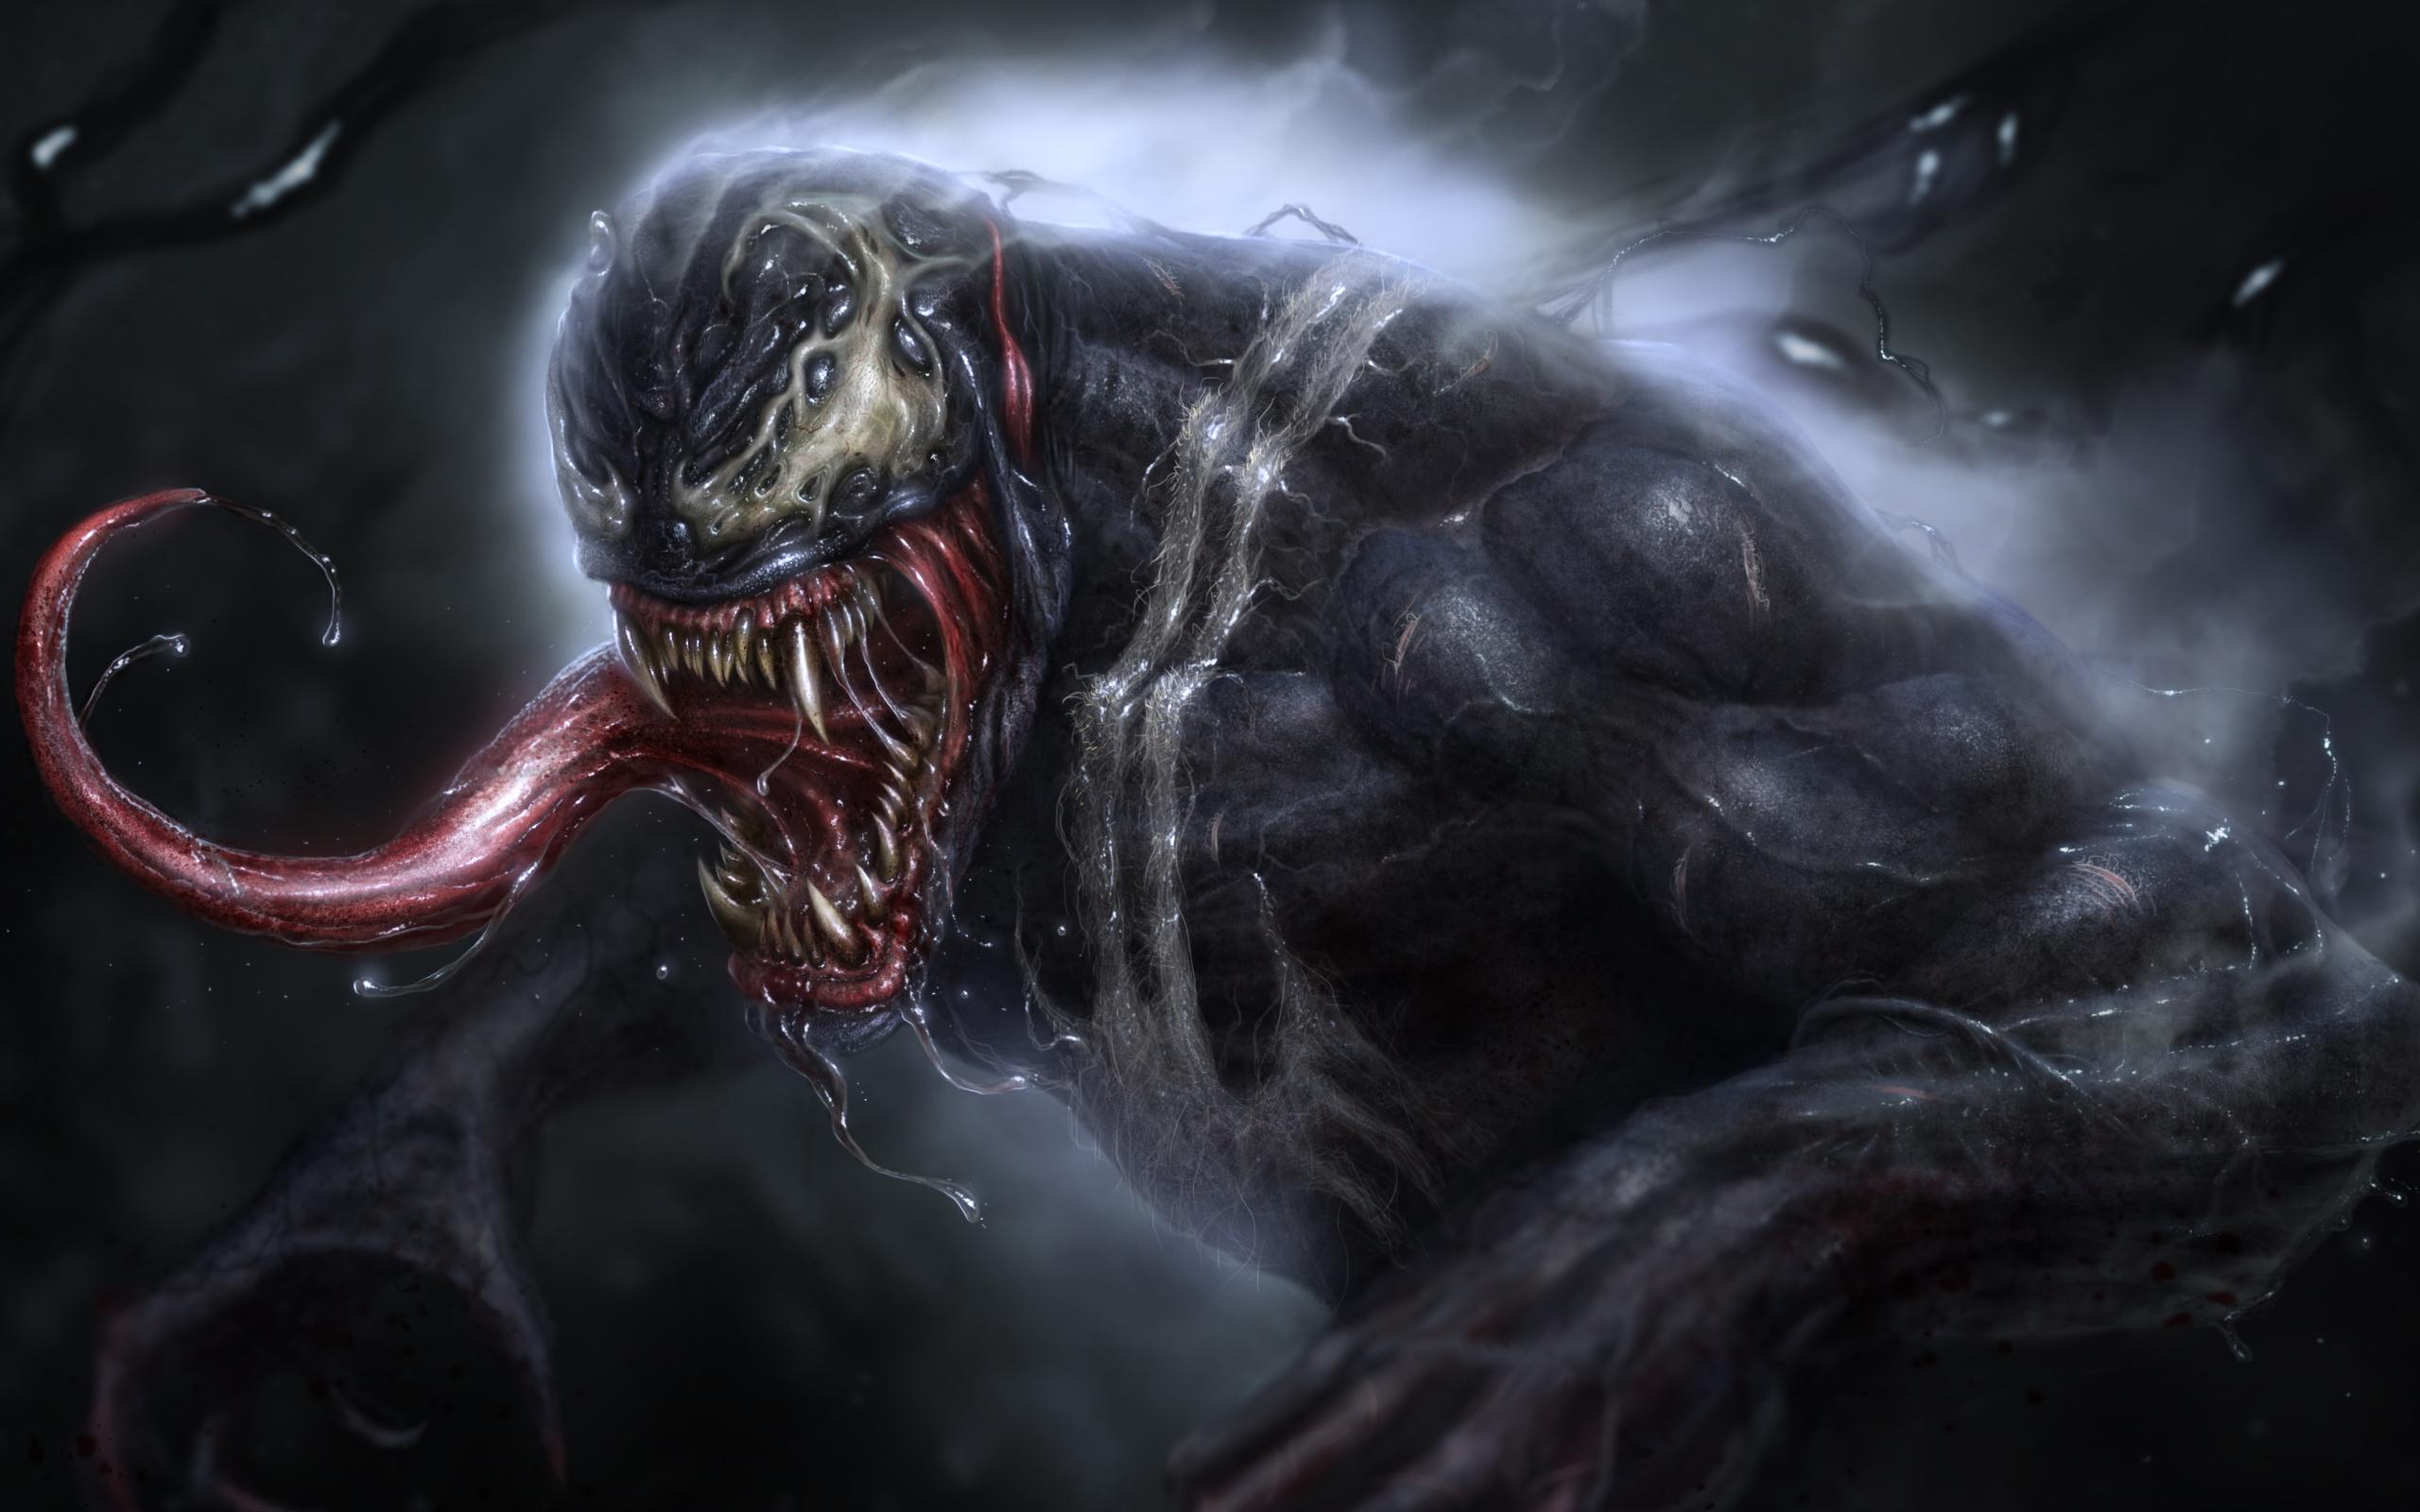 Wallpaper of Marvel, Comics, Venom background and HD image